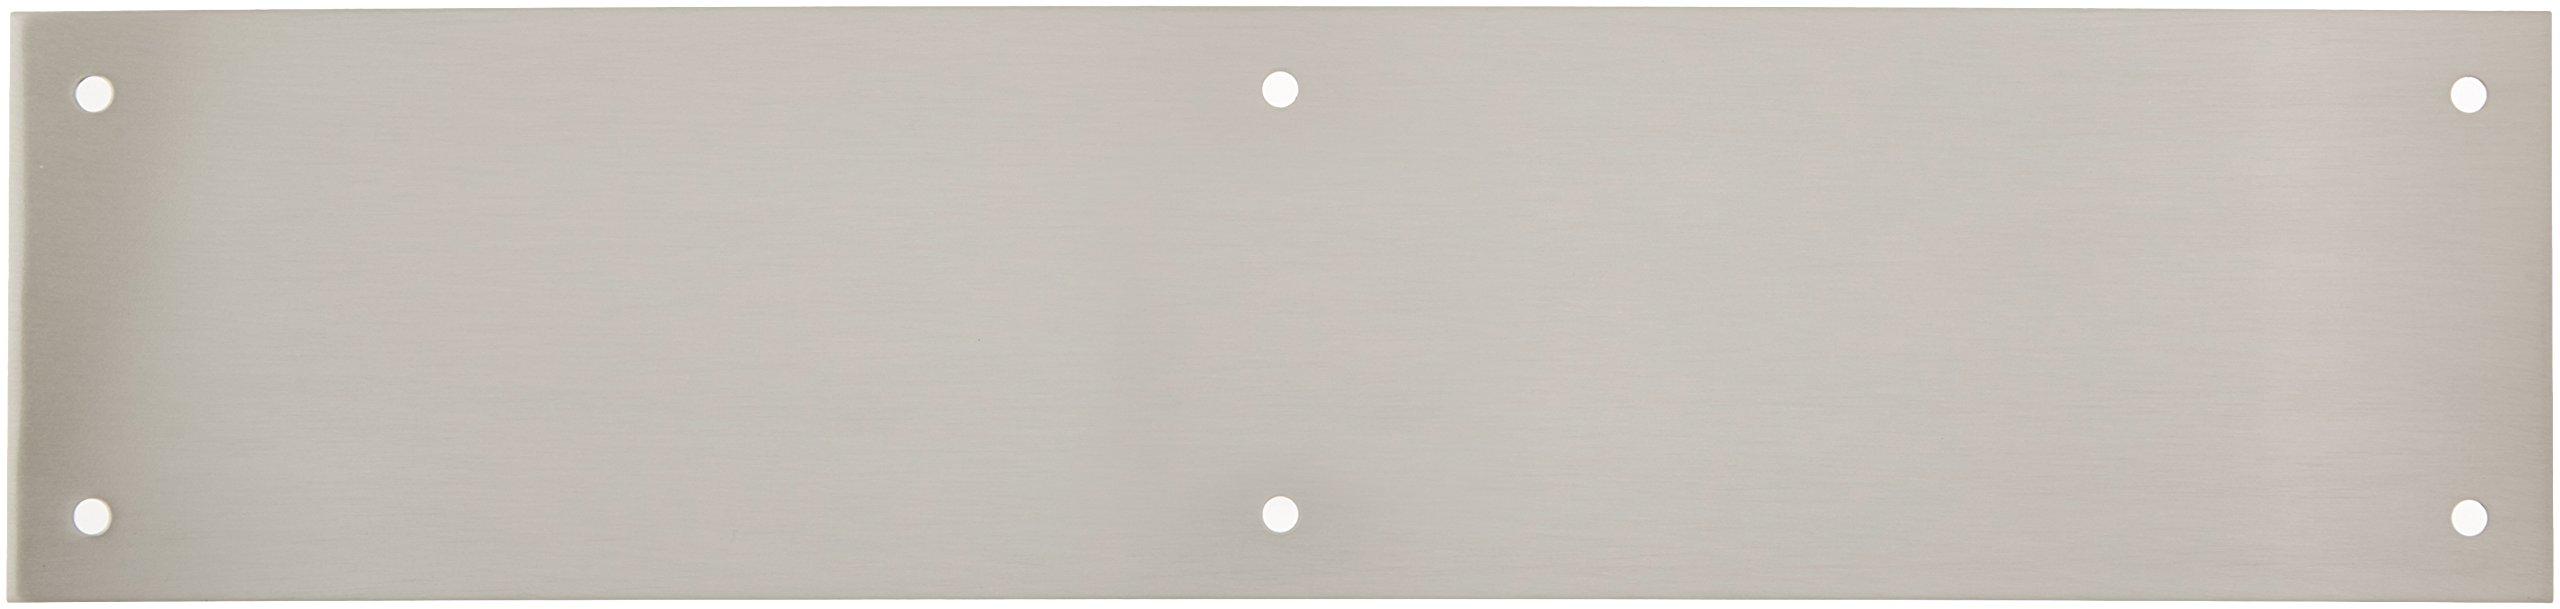 Baldwin 2123 3-1/2 Inch x 15 Inch Solid Brass Square Edge Push Plate, Satin Nickel